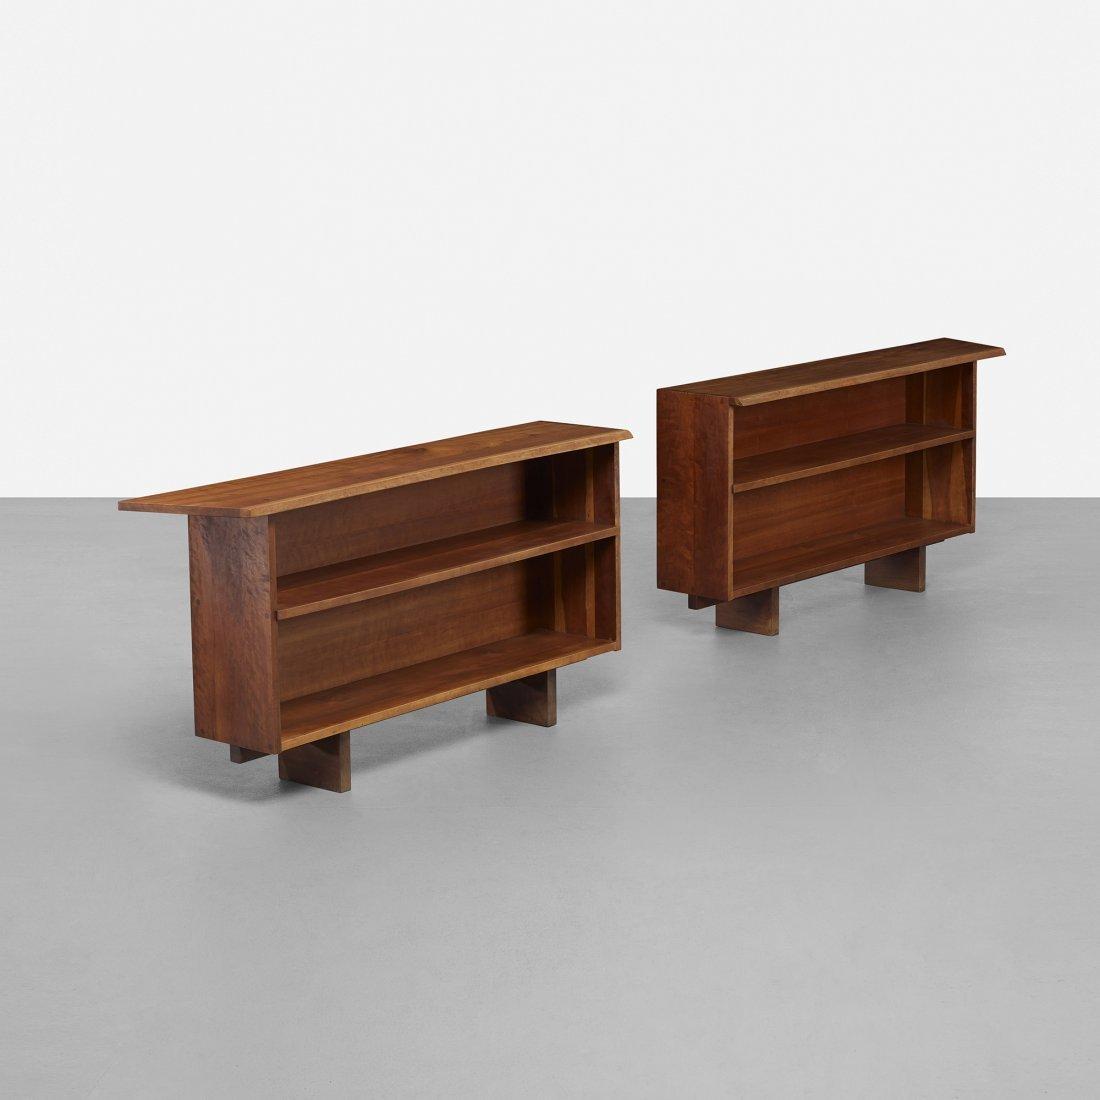 George Nakashima custom bookcases, pair